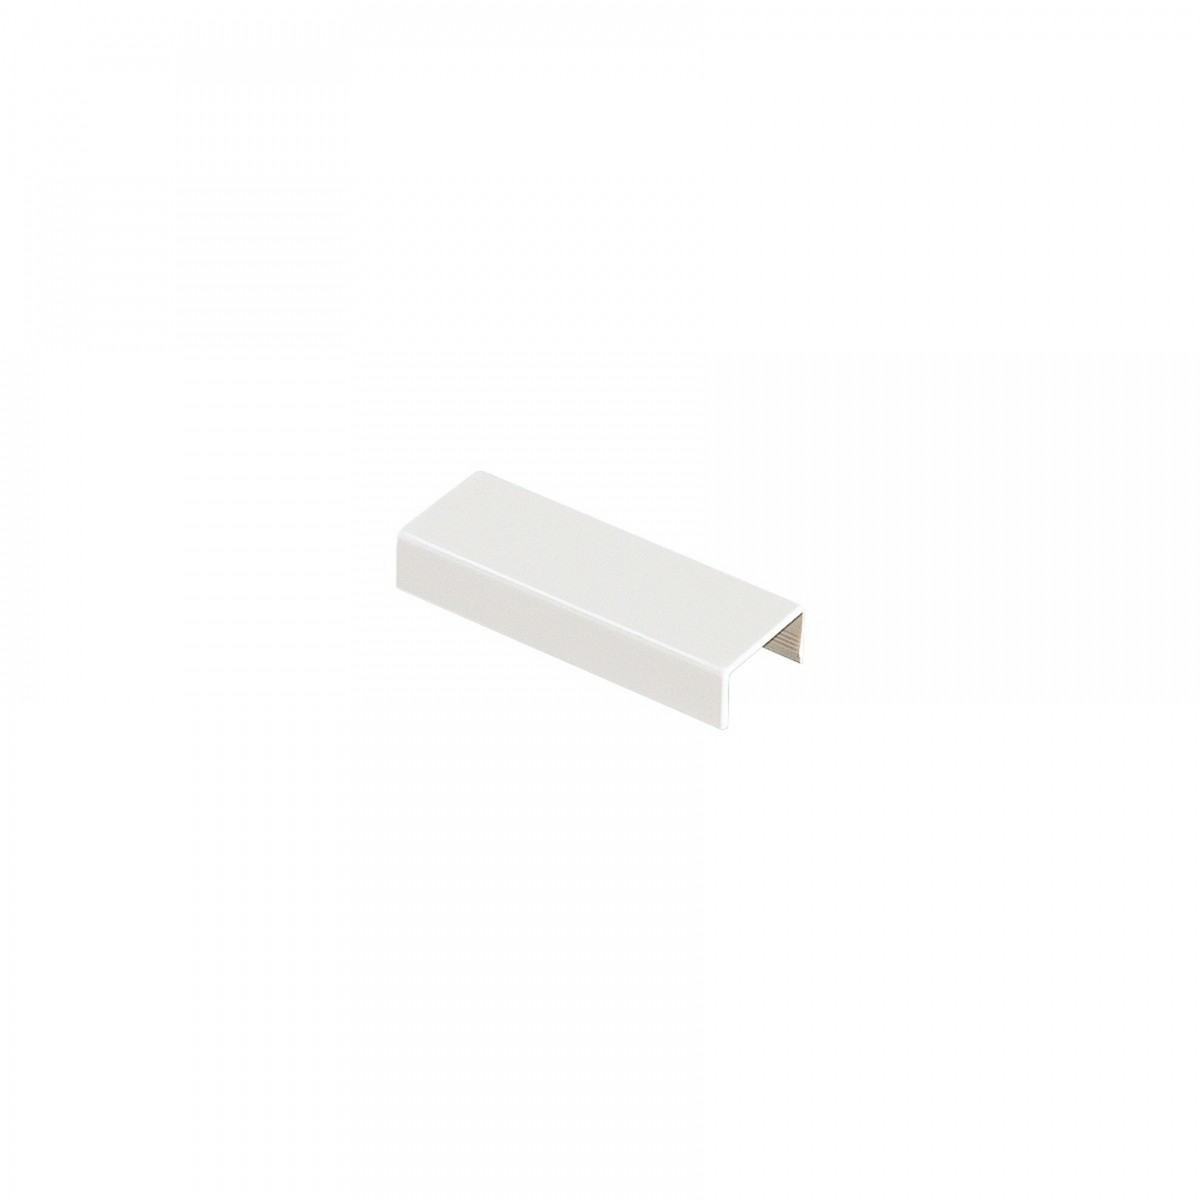 Elétrica Luva 20x10 Tramontina Branco Palha